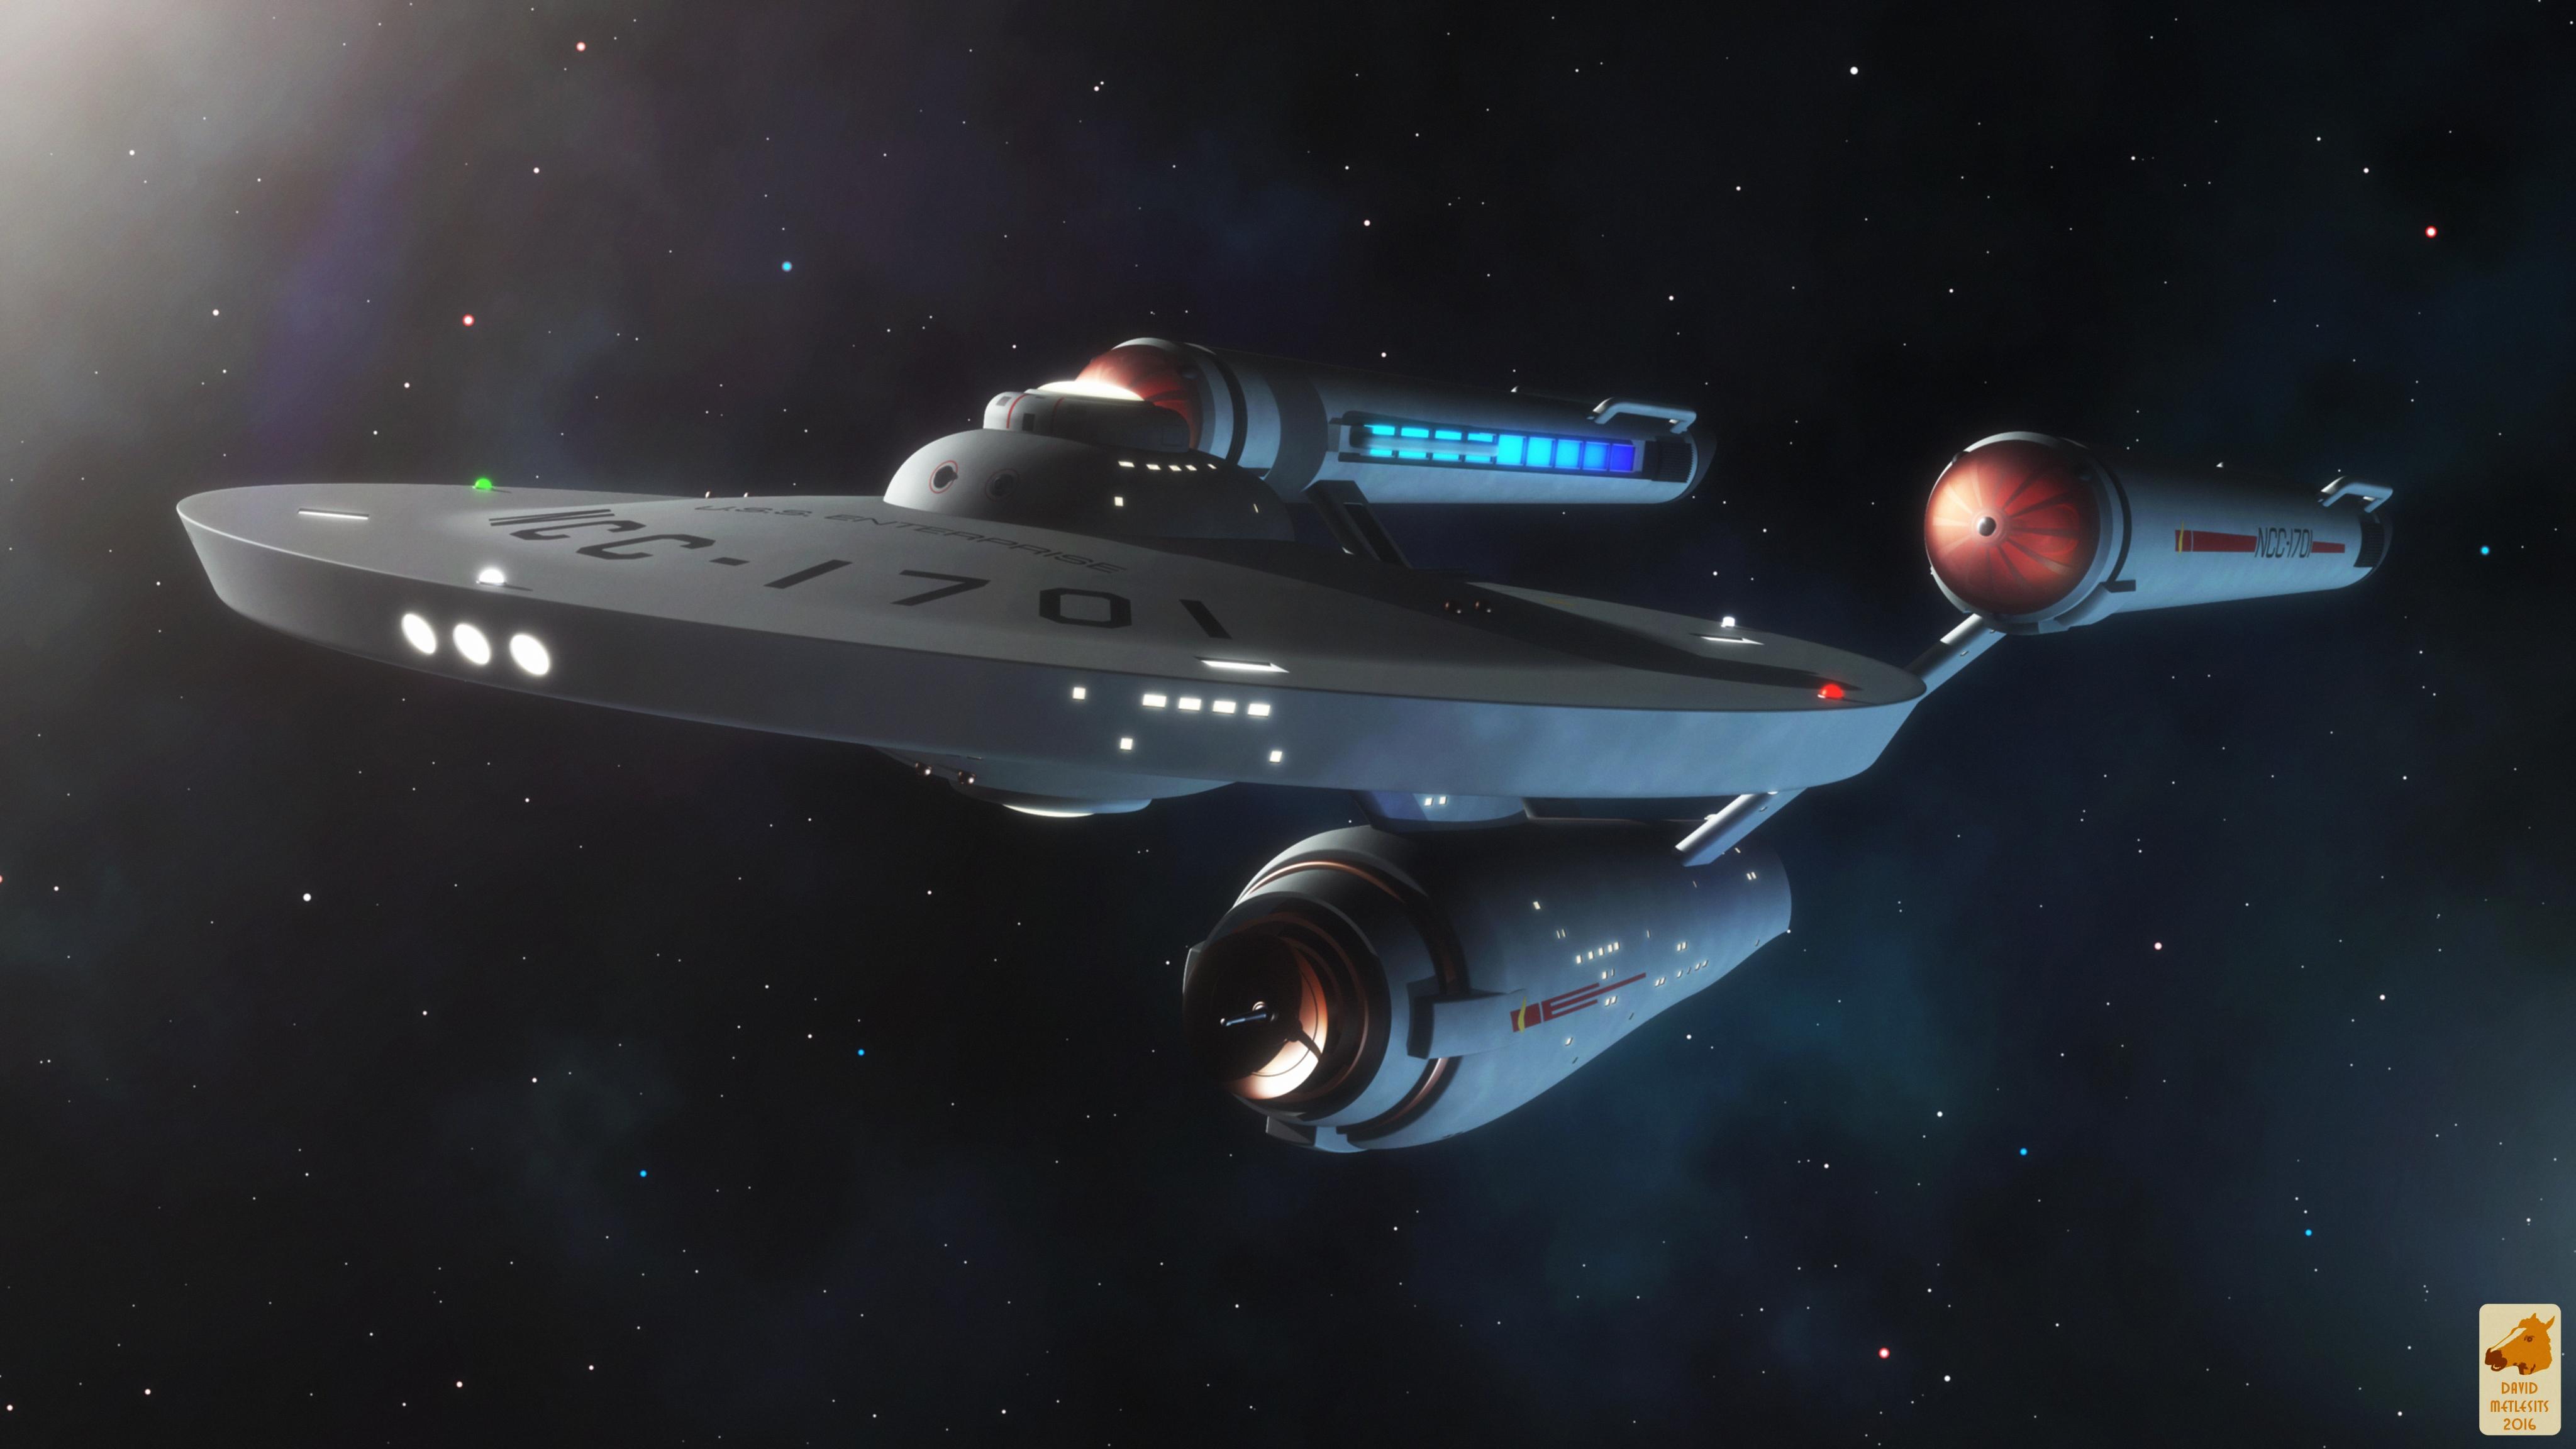 Franz Joseph's Enterprise by thefirstfleet